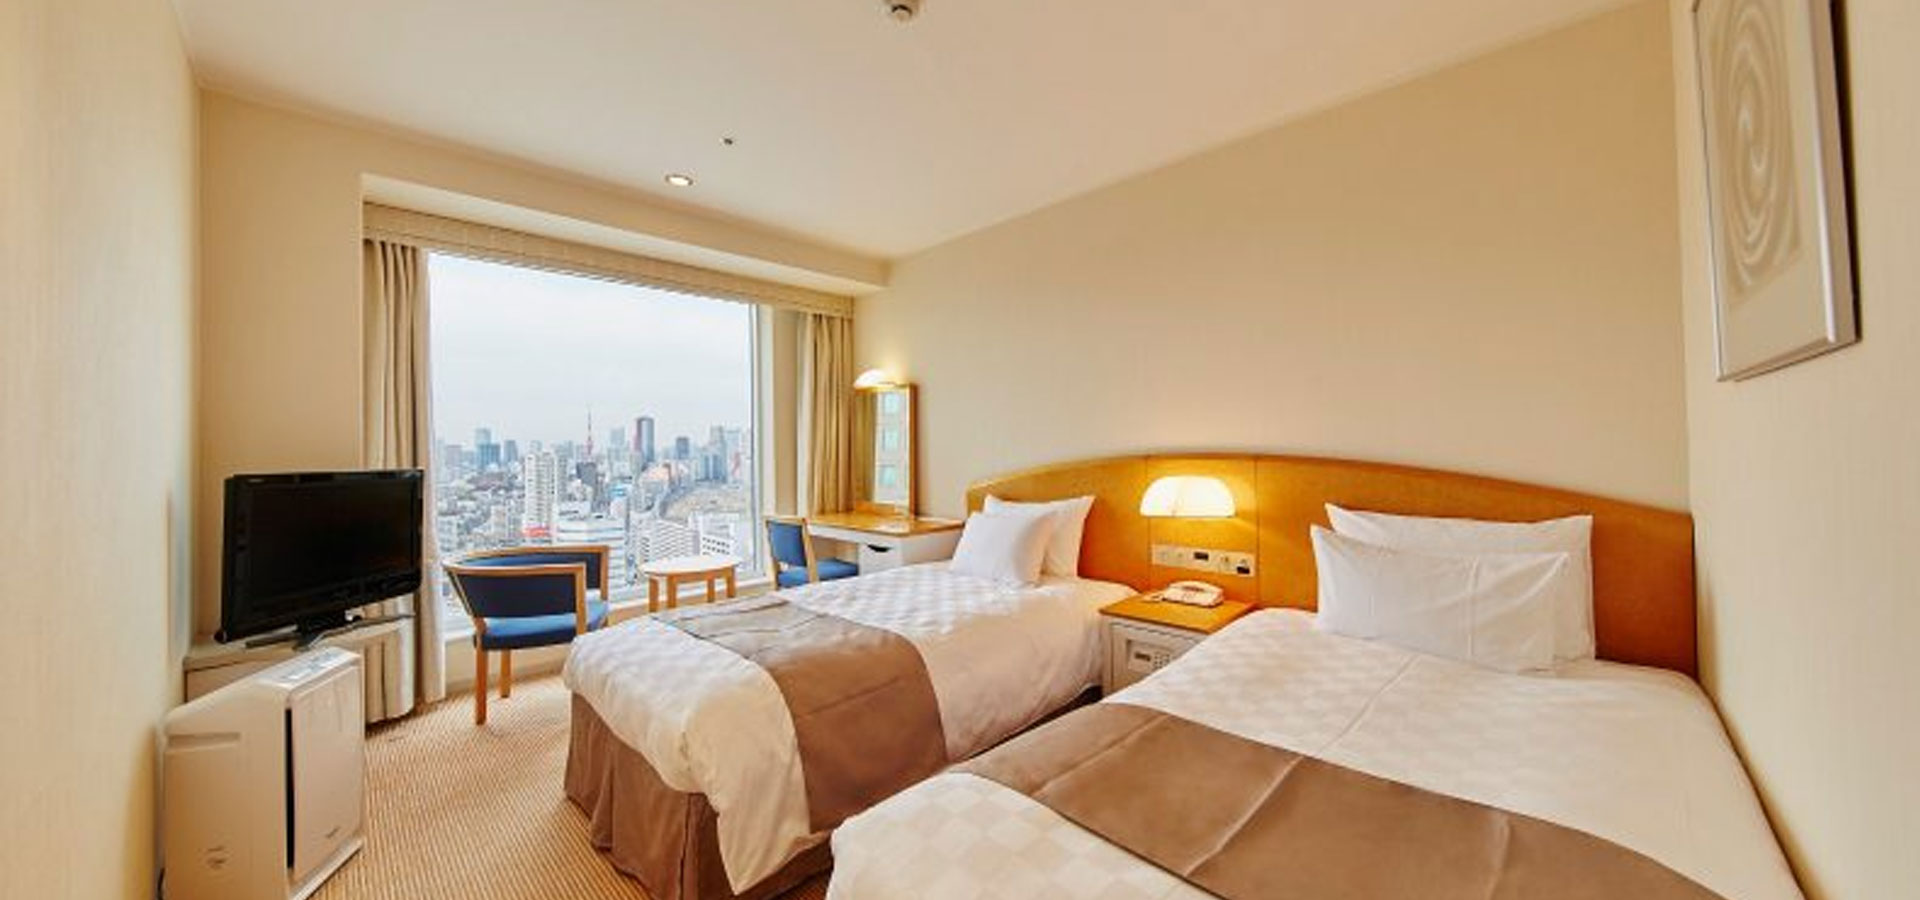 Twin Room (21.0m2, 17th – 27th floors)